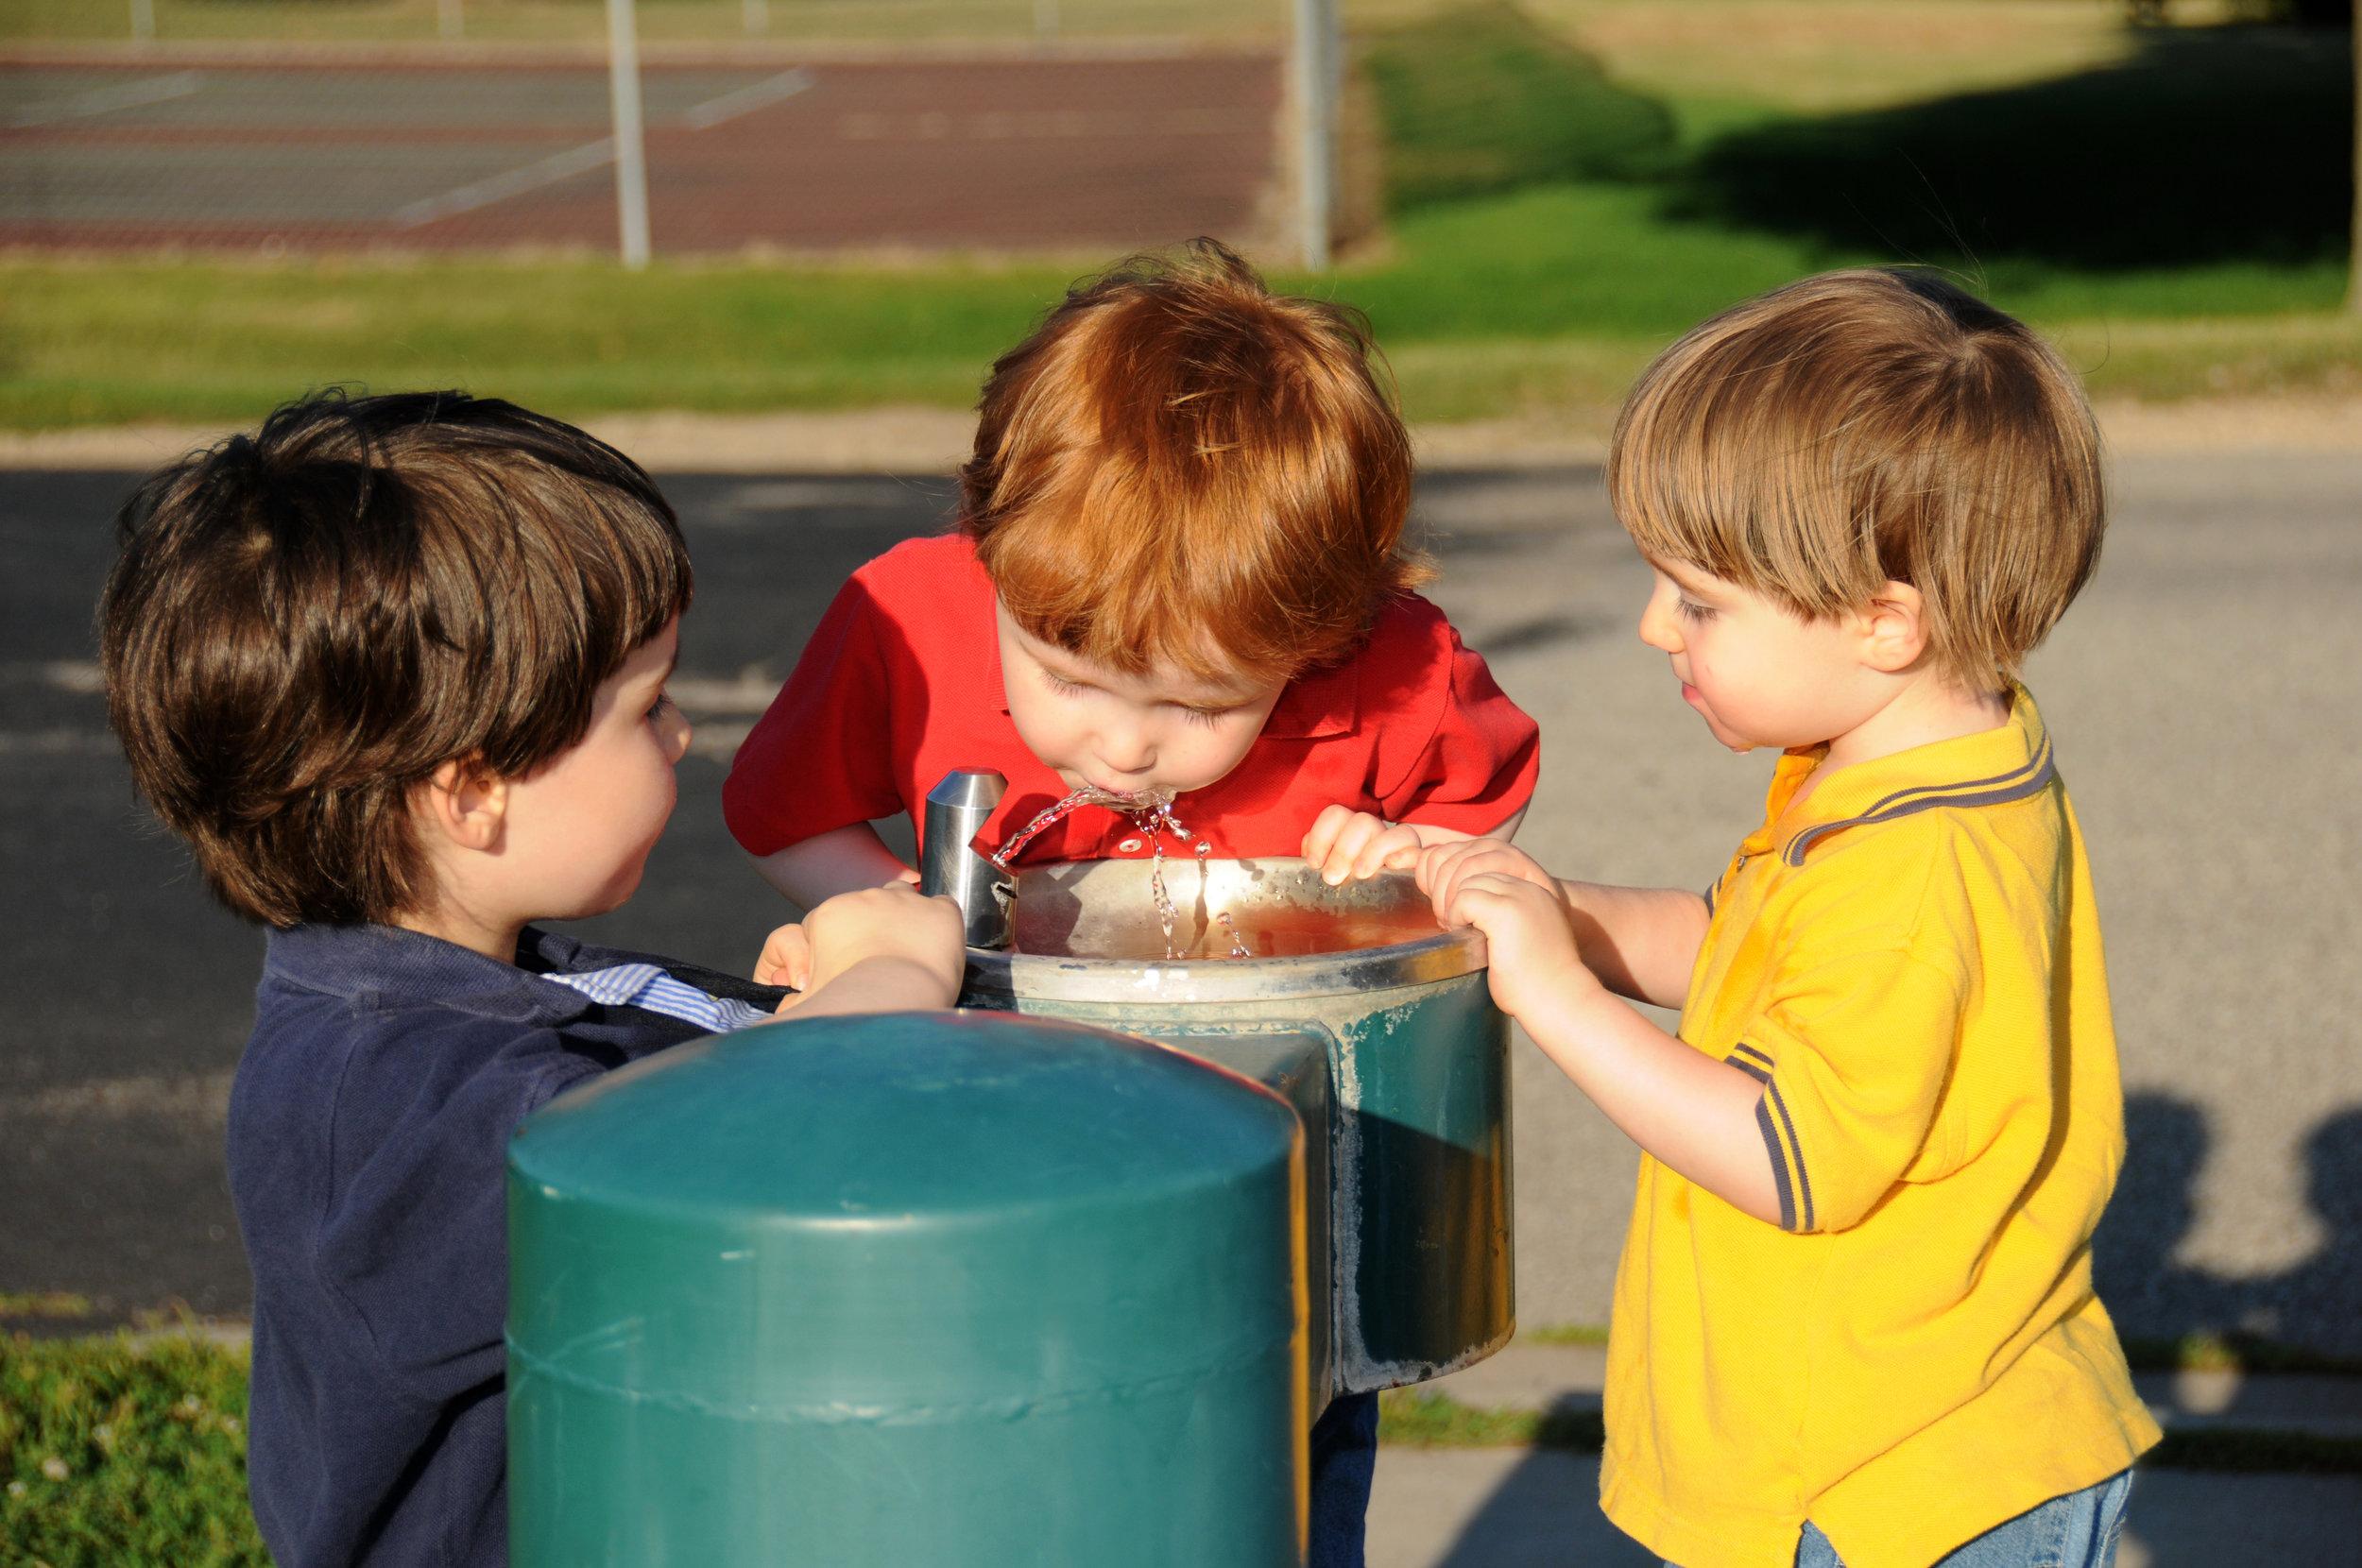 Drinking water lead testing in schools